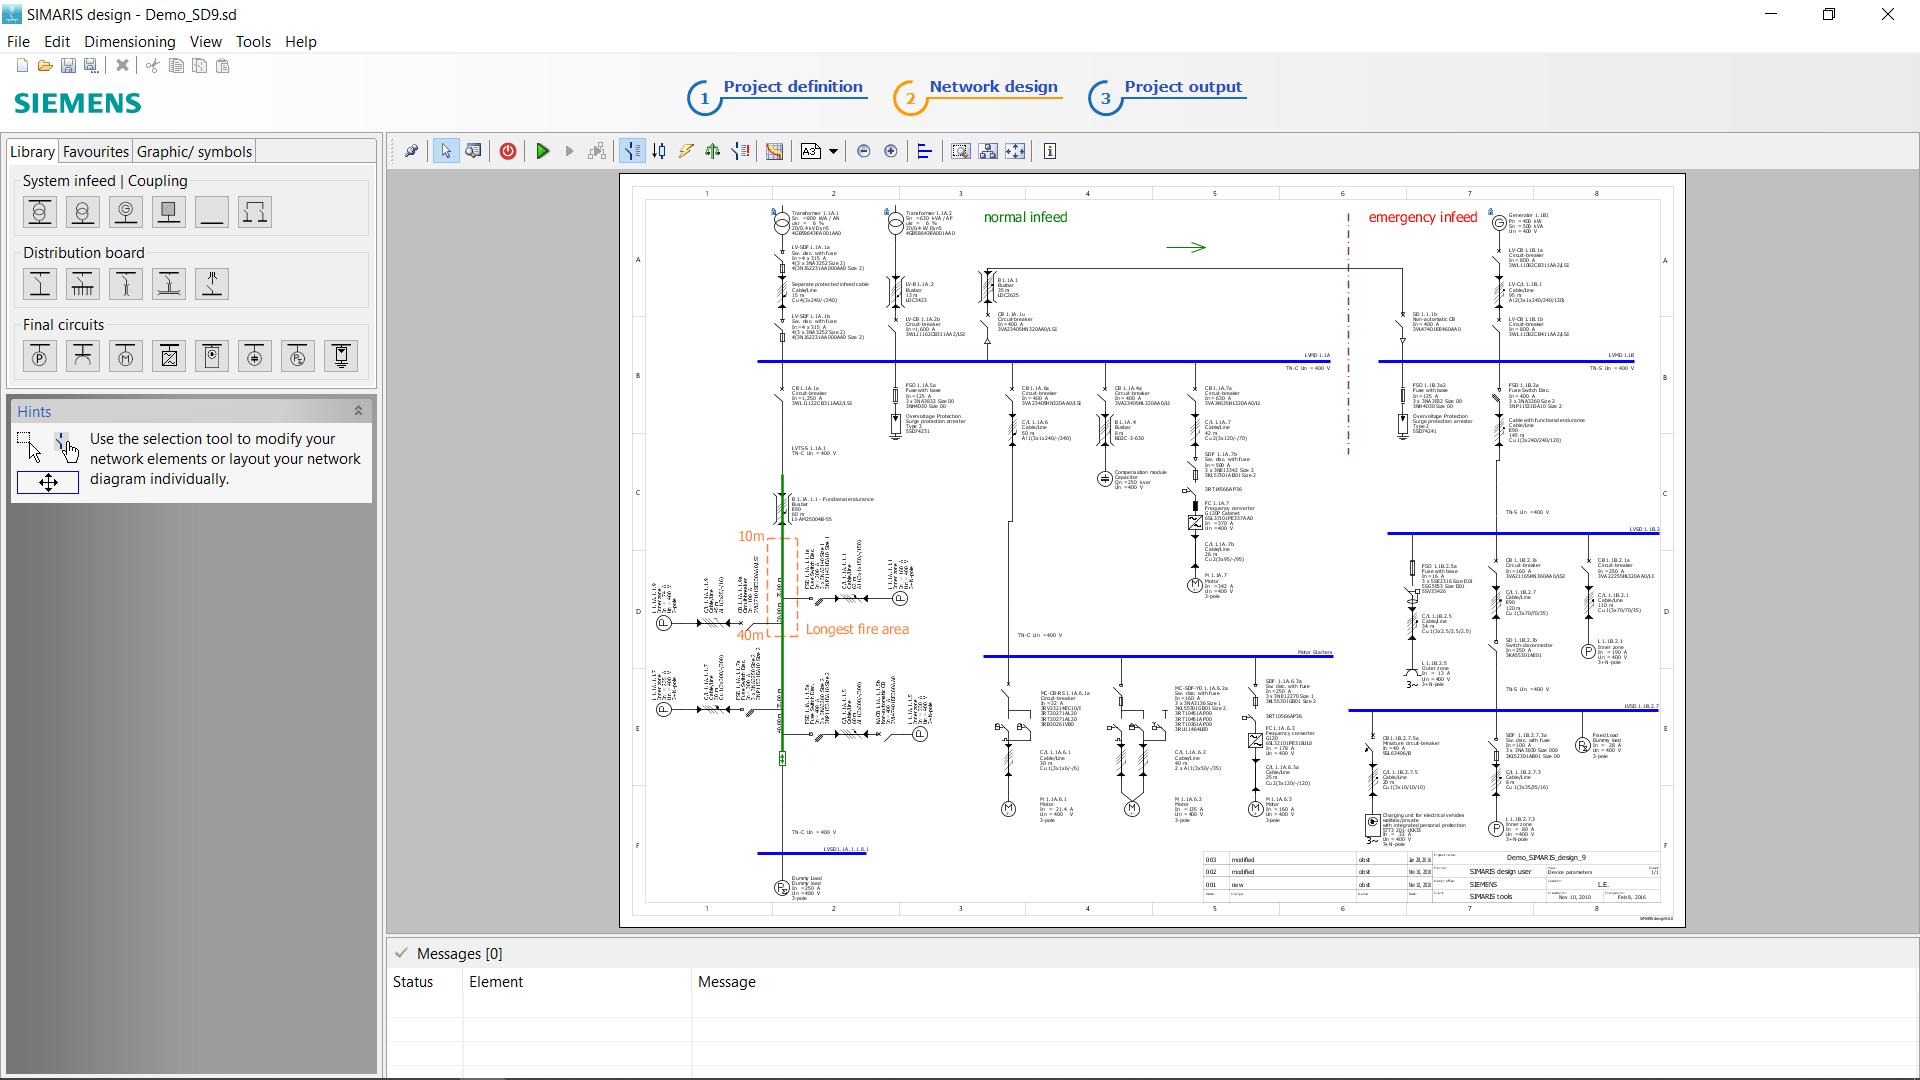 Phần mềm Simaris Design Siemens